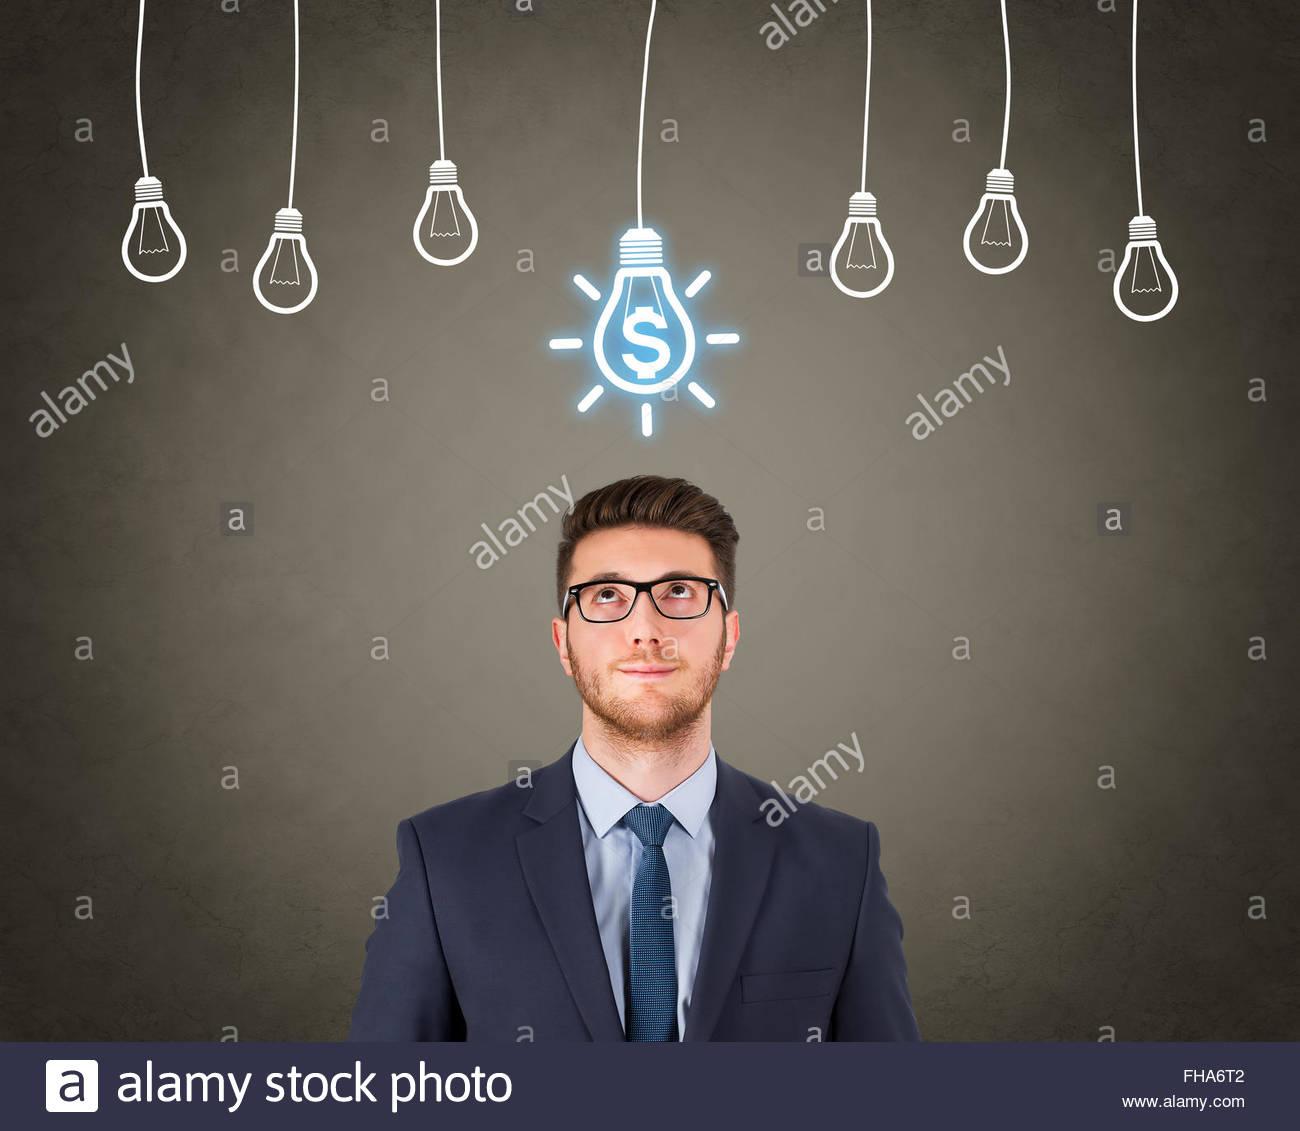 Finance Concept New Idea - Stock Image